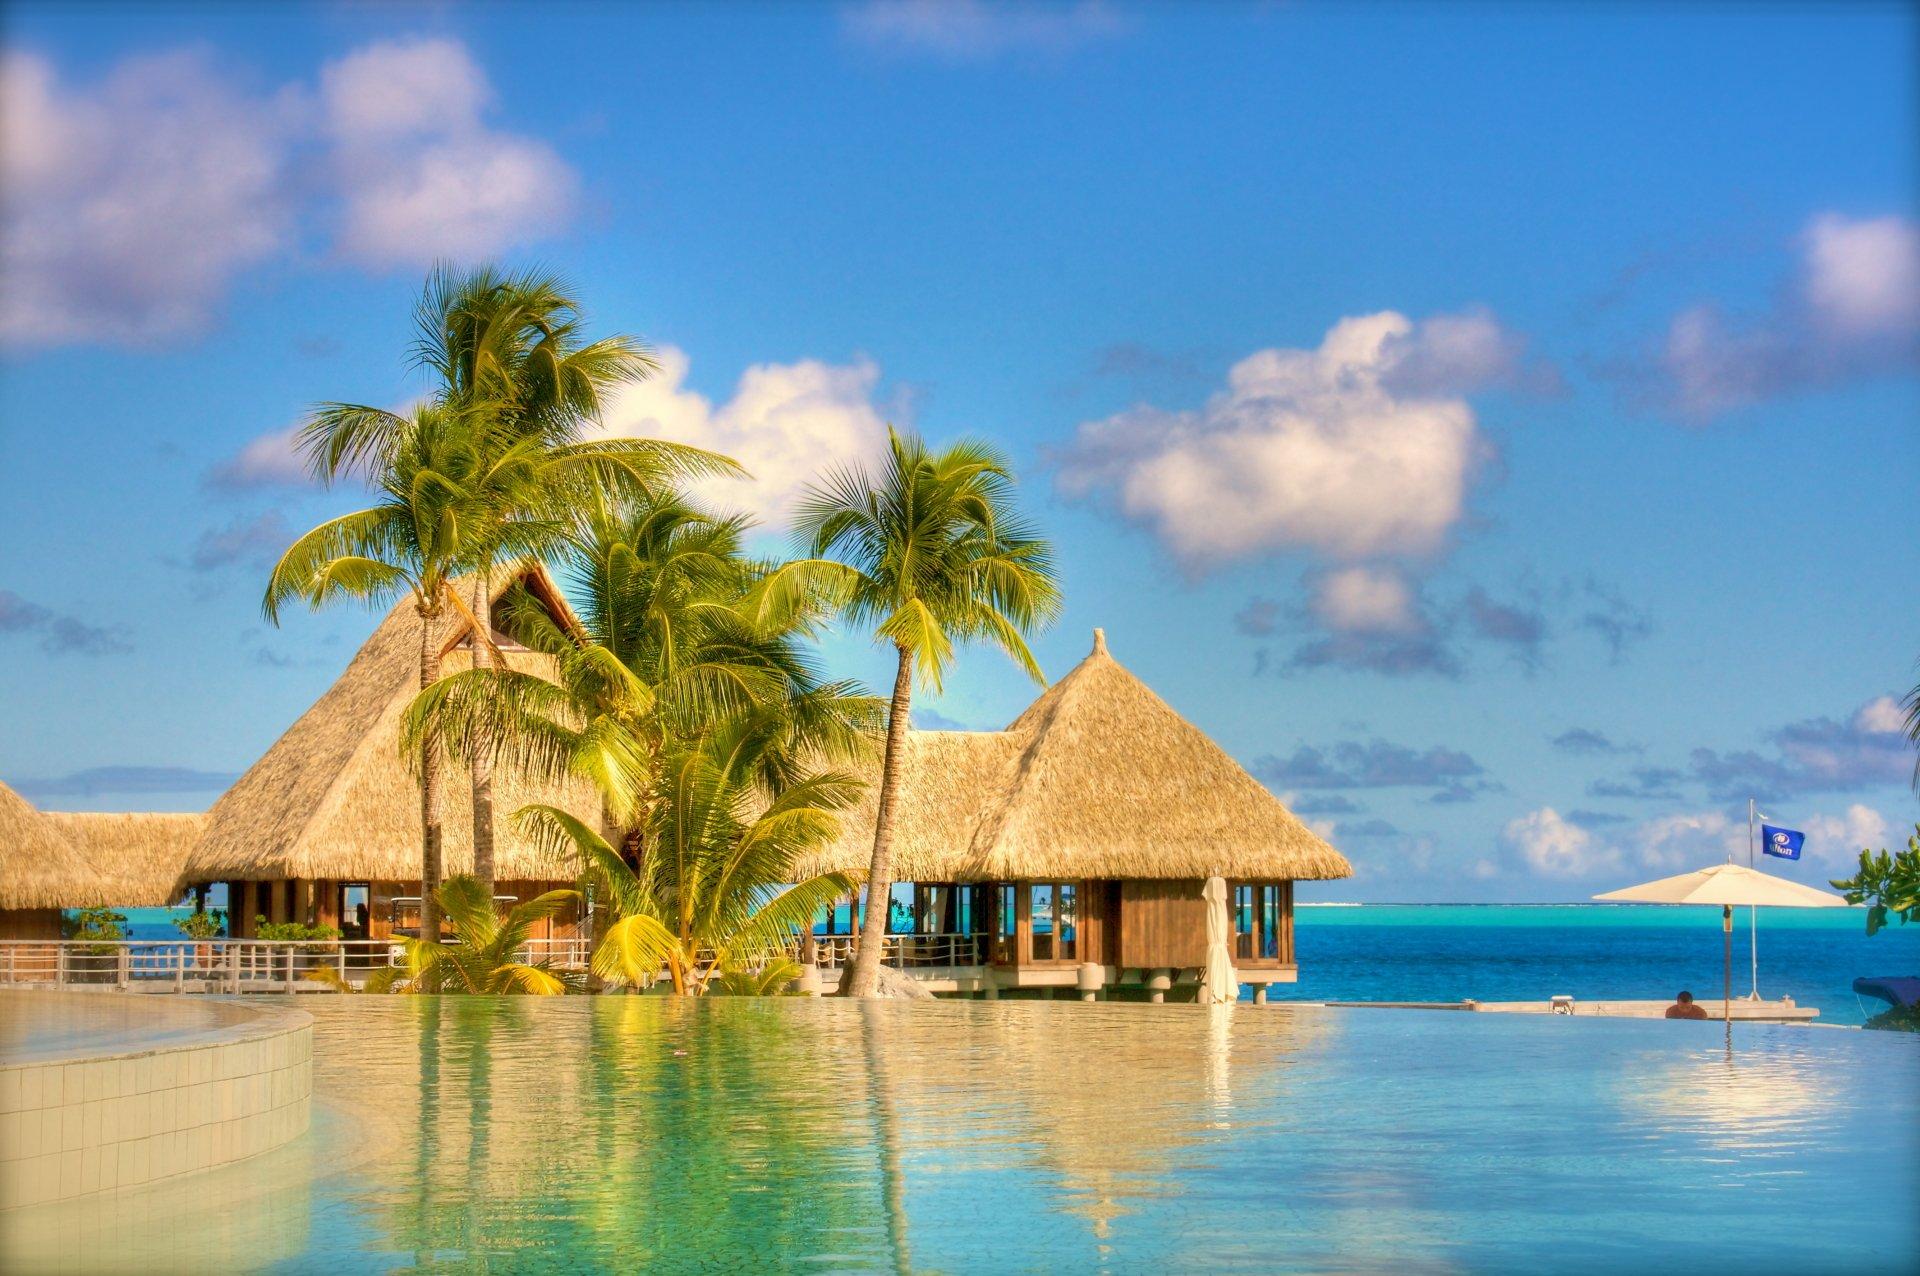 tropical beach resort 4k ultra hd fond d 39 cran and arri re plan 4258x2830 id 675973. Black Bedroom Furniture Sets. Home Design Ideas